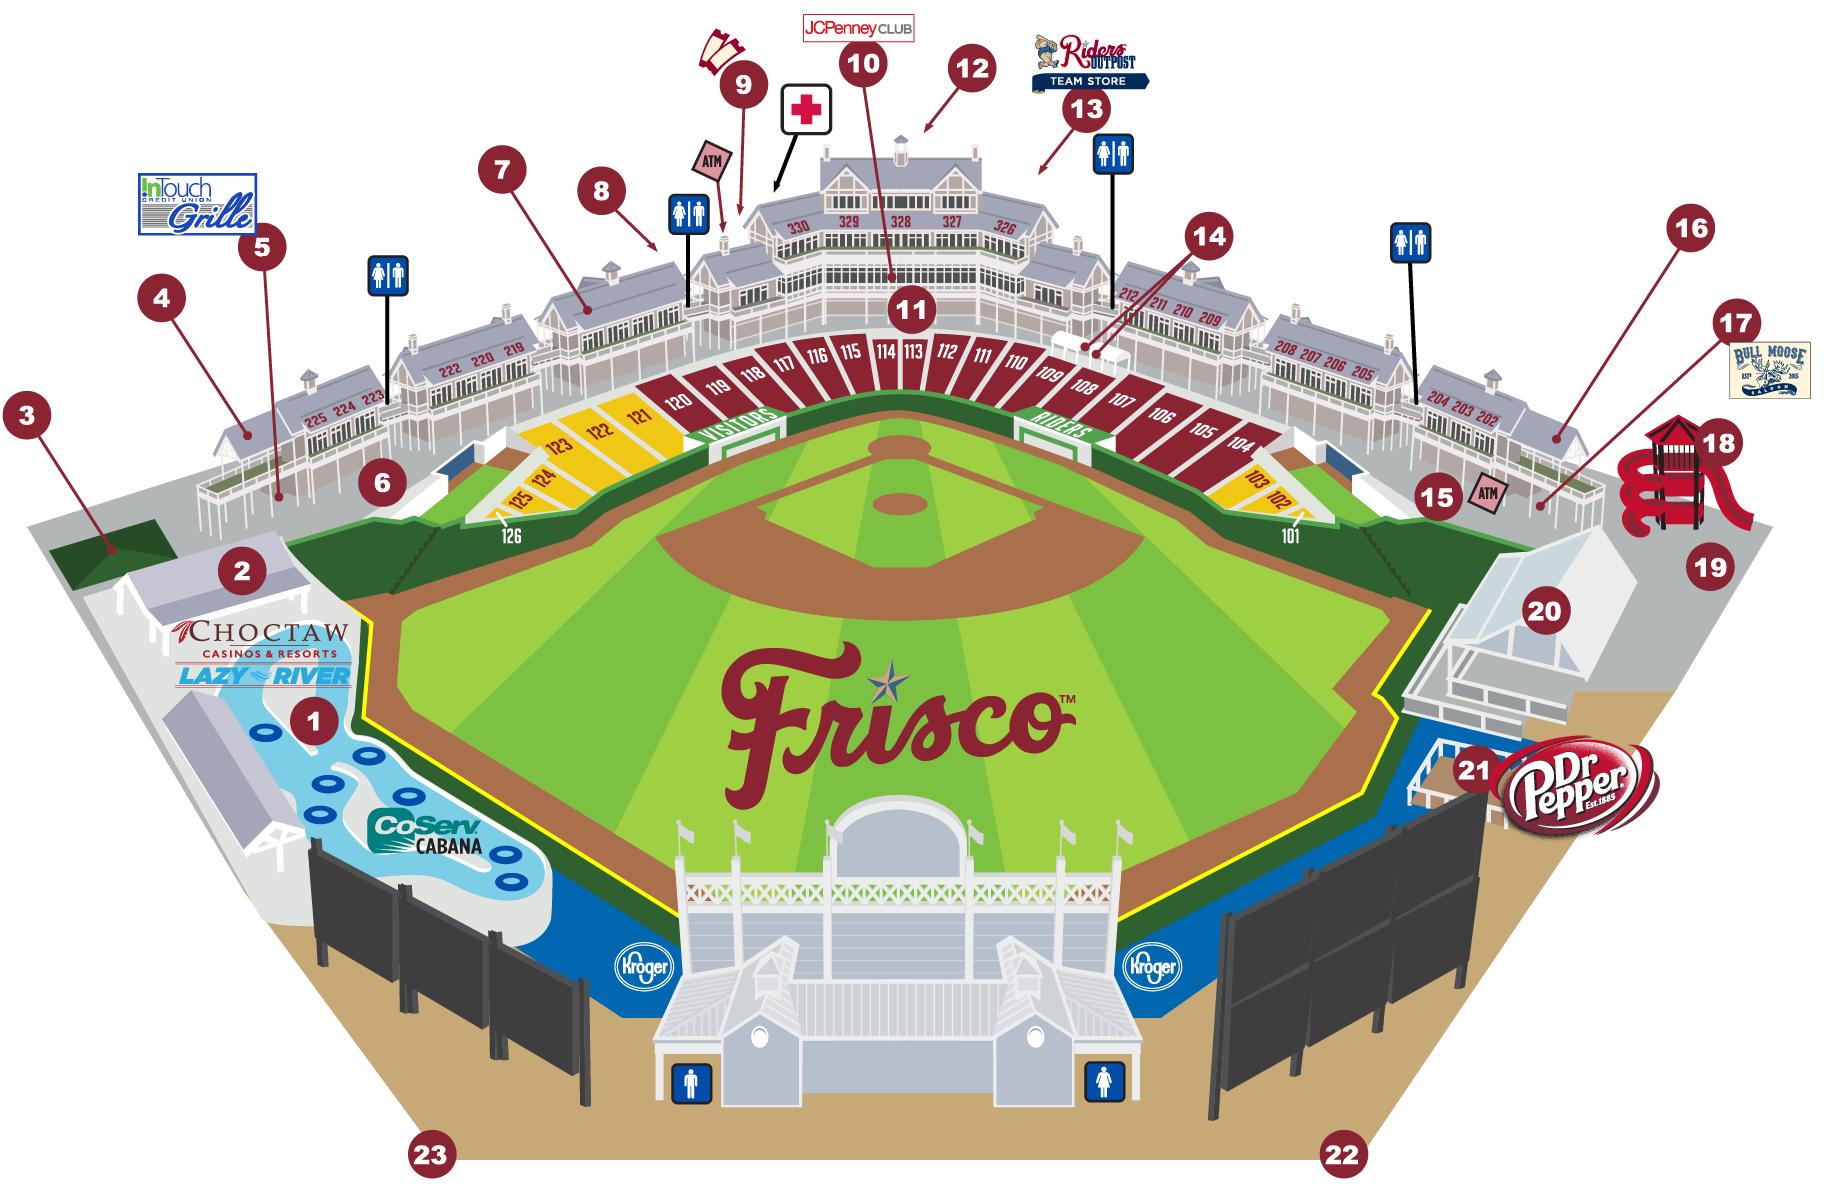 Frisco-3-BallparkMagic_BallparkMap-1.png